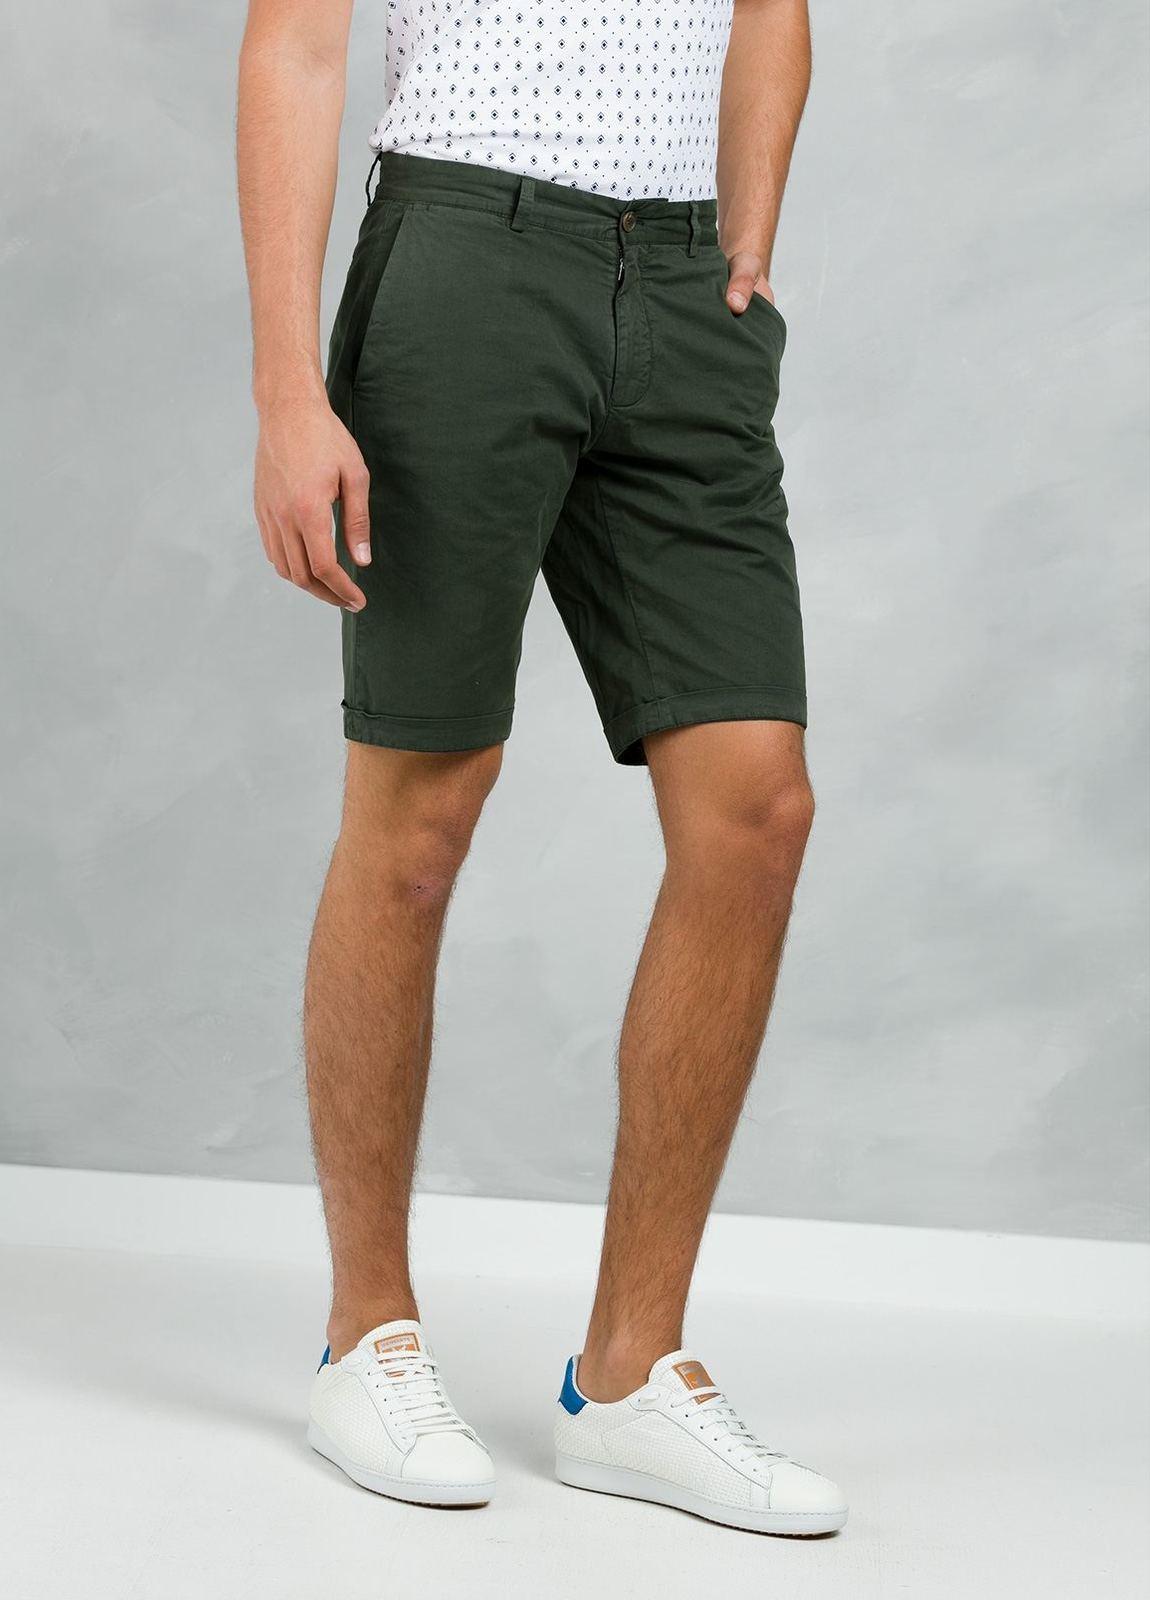 Bermuda ligeramente slim fit color kaki, 100% Algodón. - Ítem1